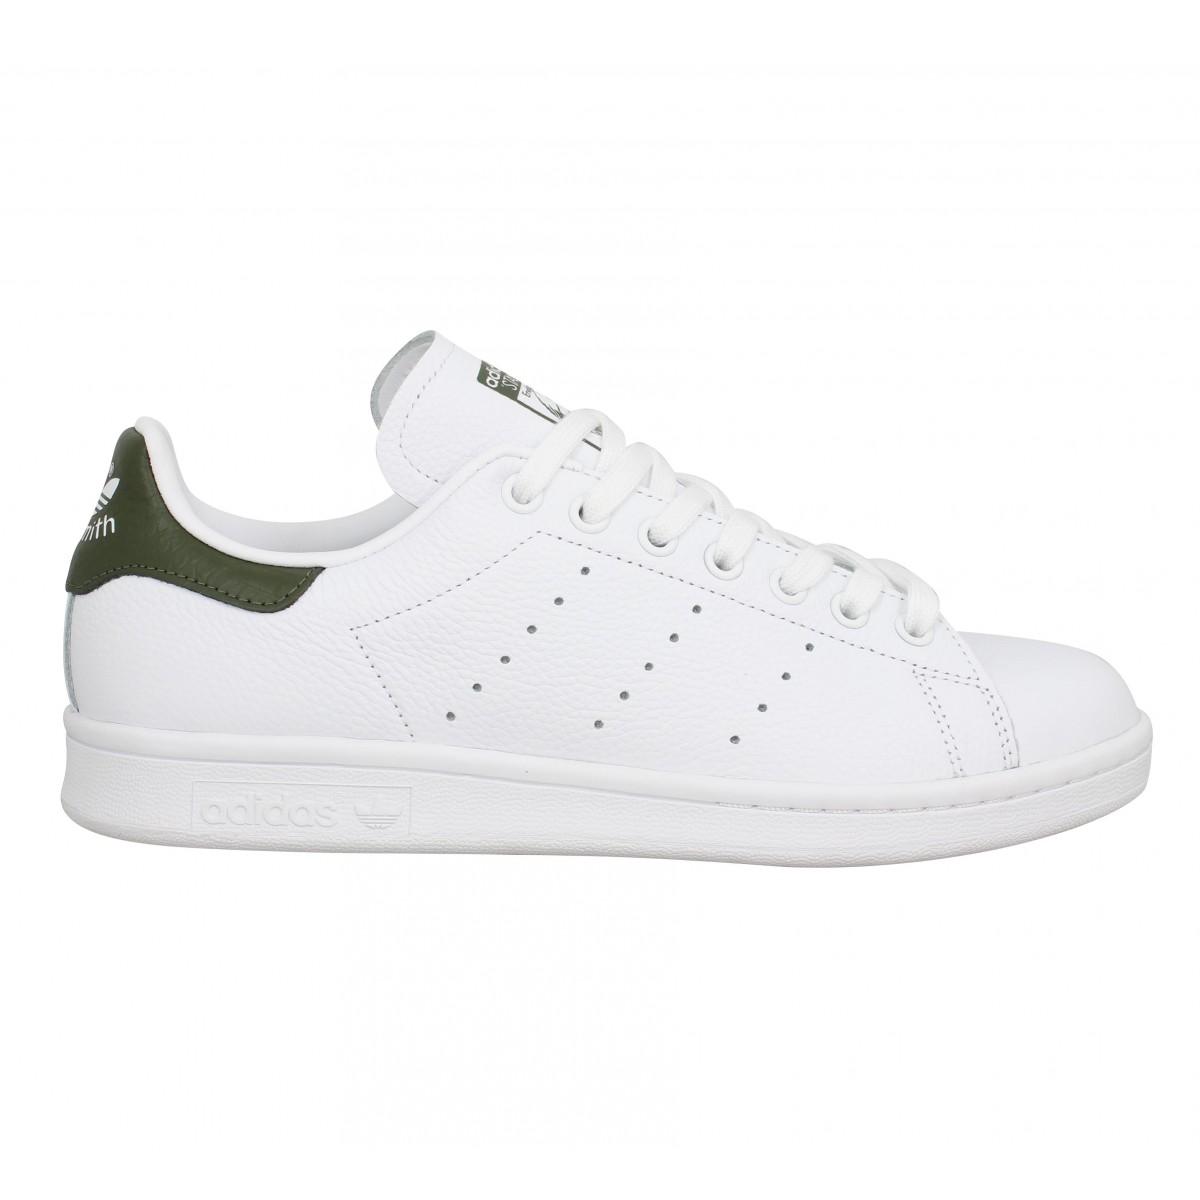 Chaussures Adidas stan smith cuir blanc kaki femme homme | Fanny ...